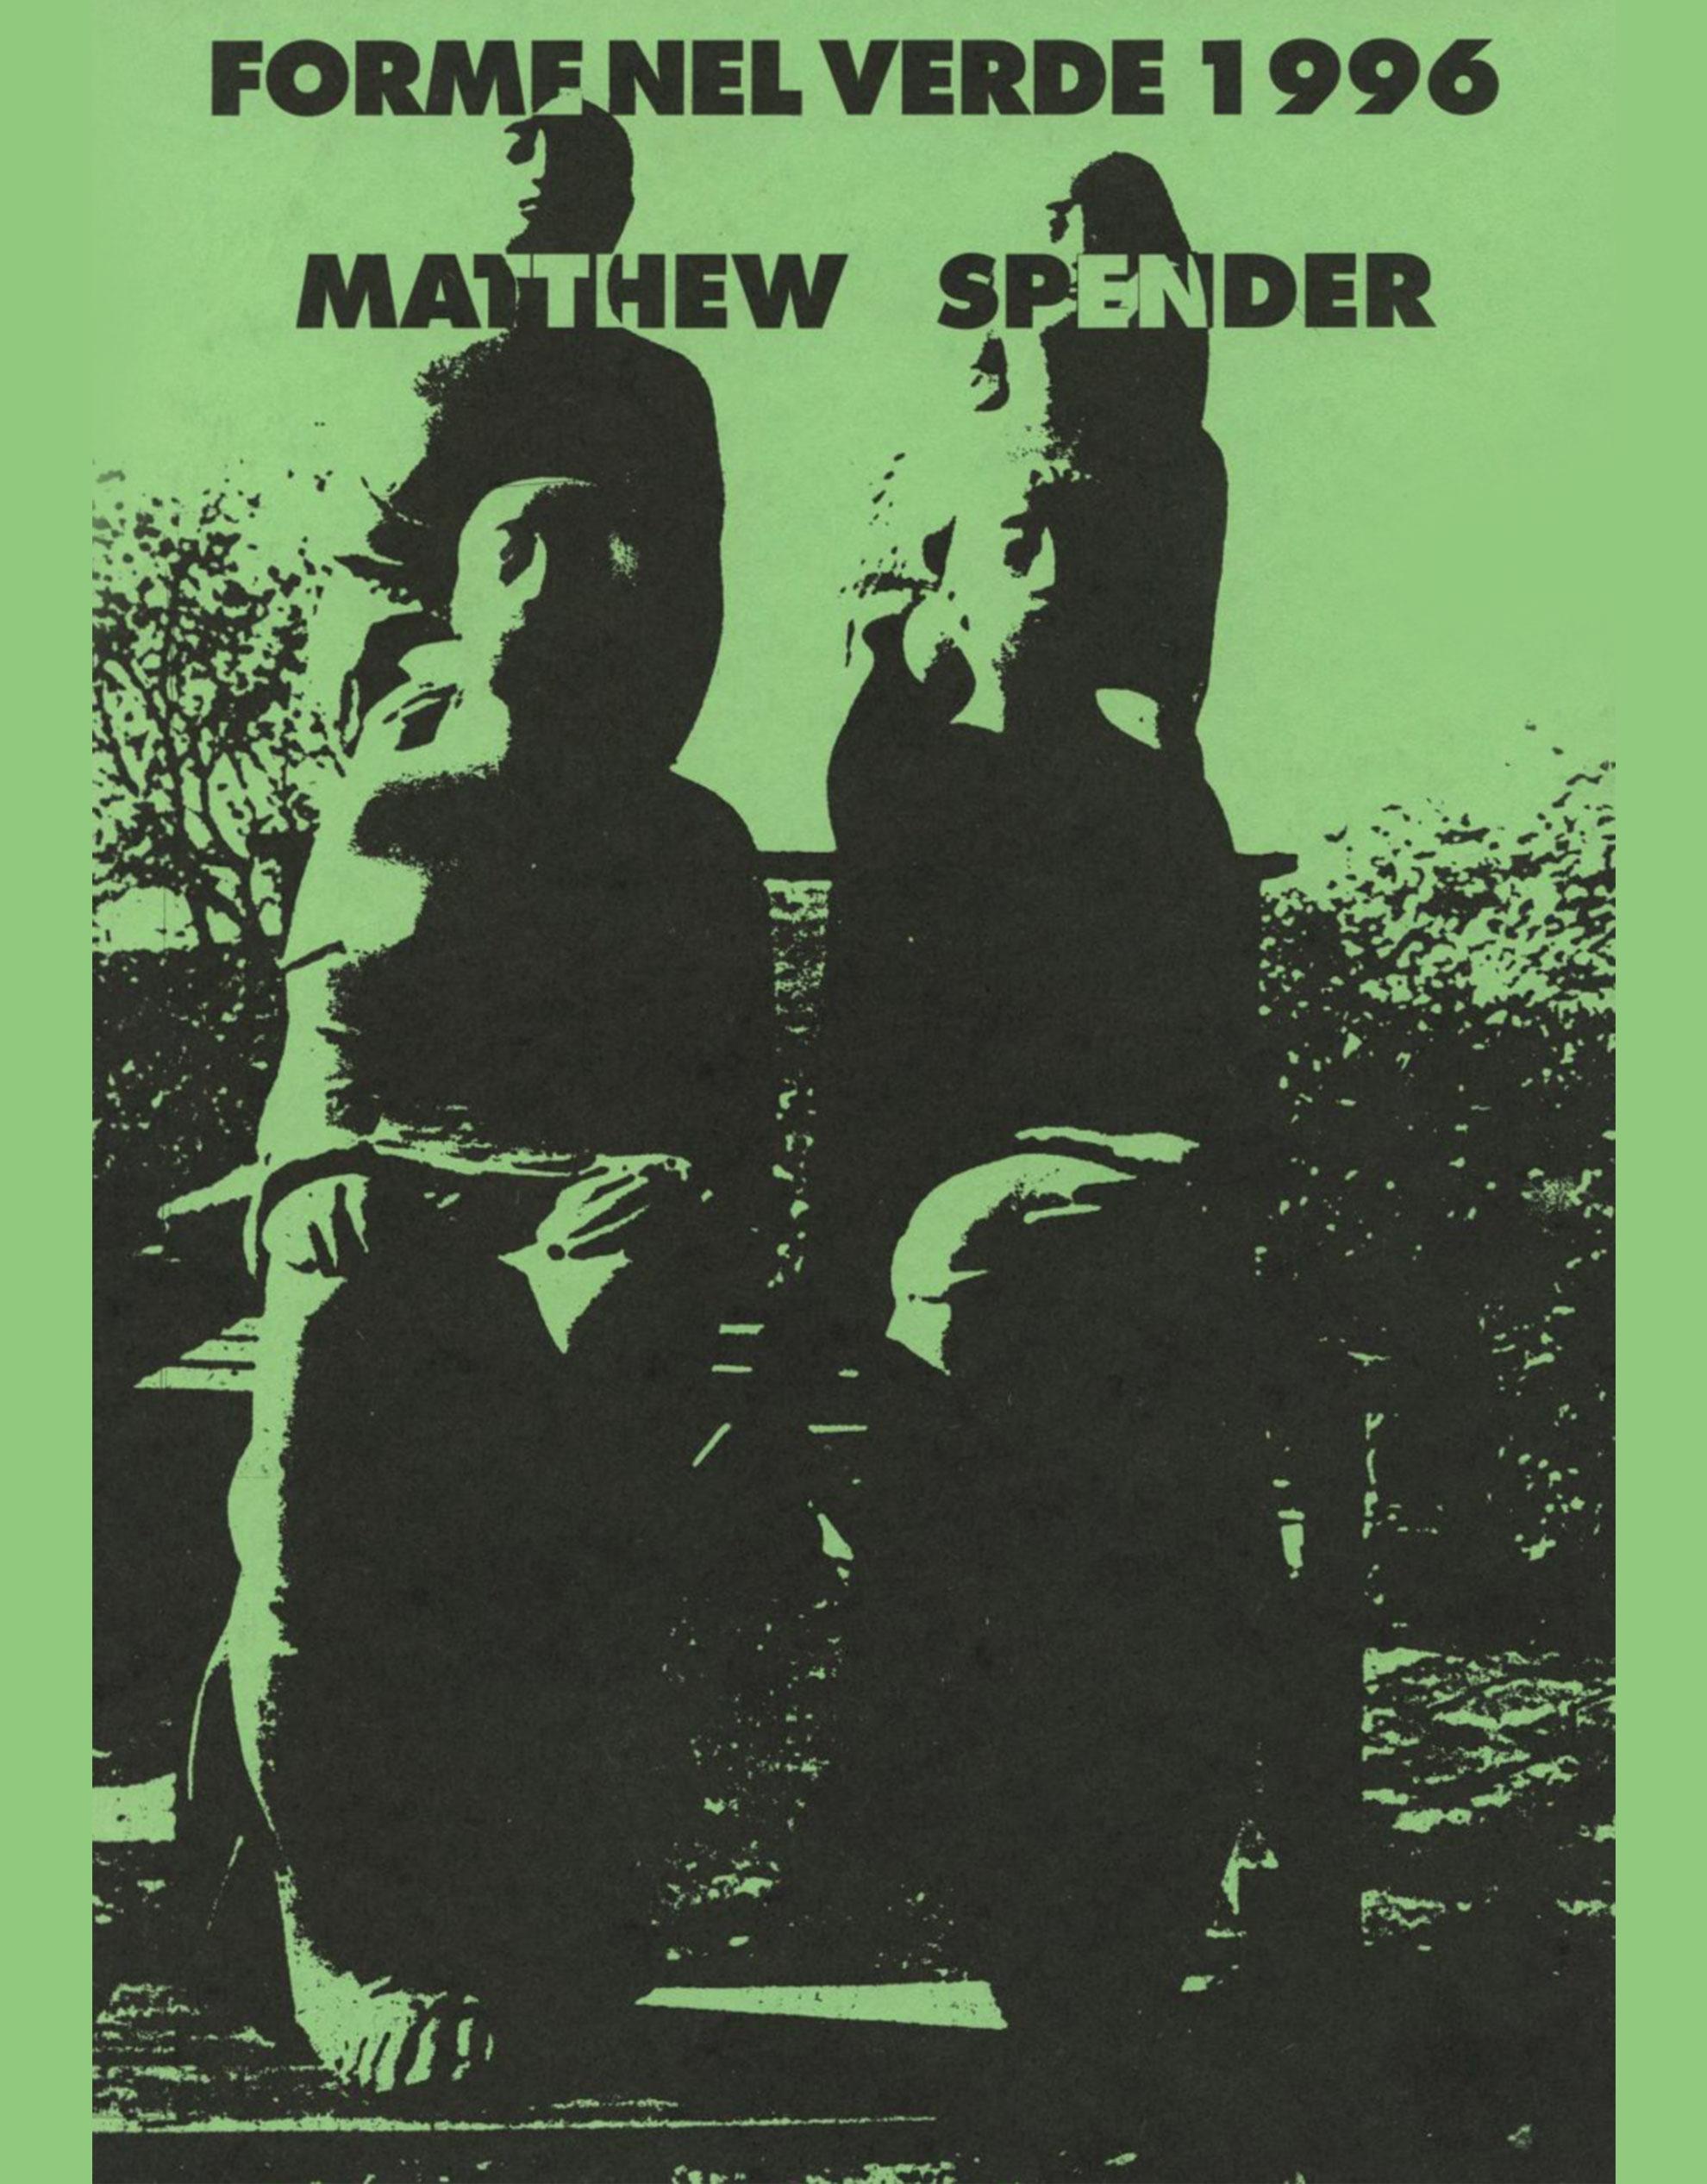 Catalogo Forme nel Verde 1996